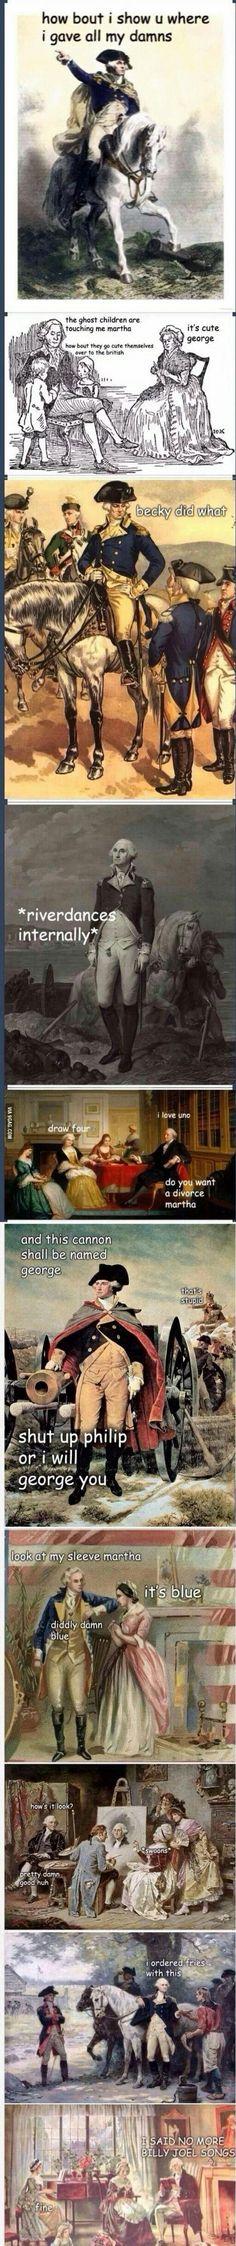 George Washington Adventures